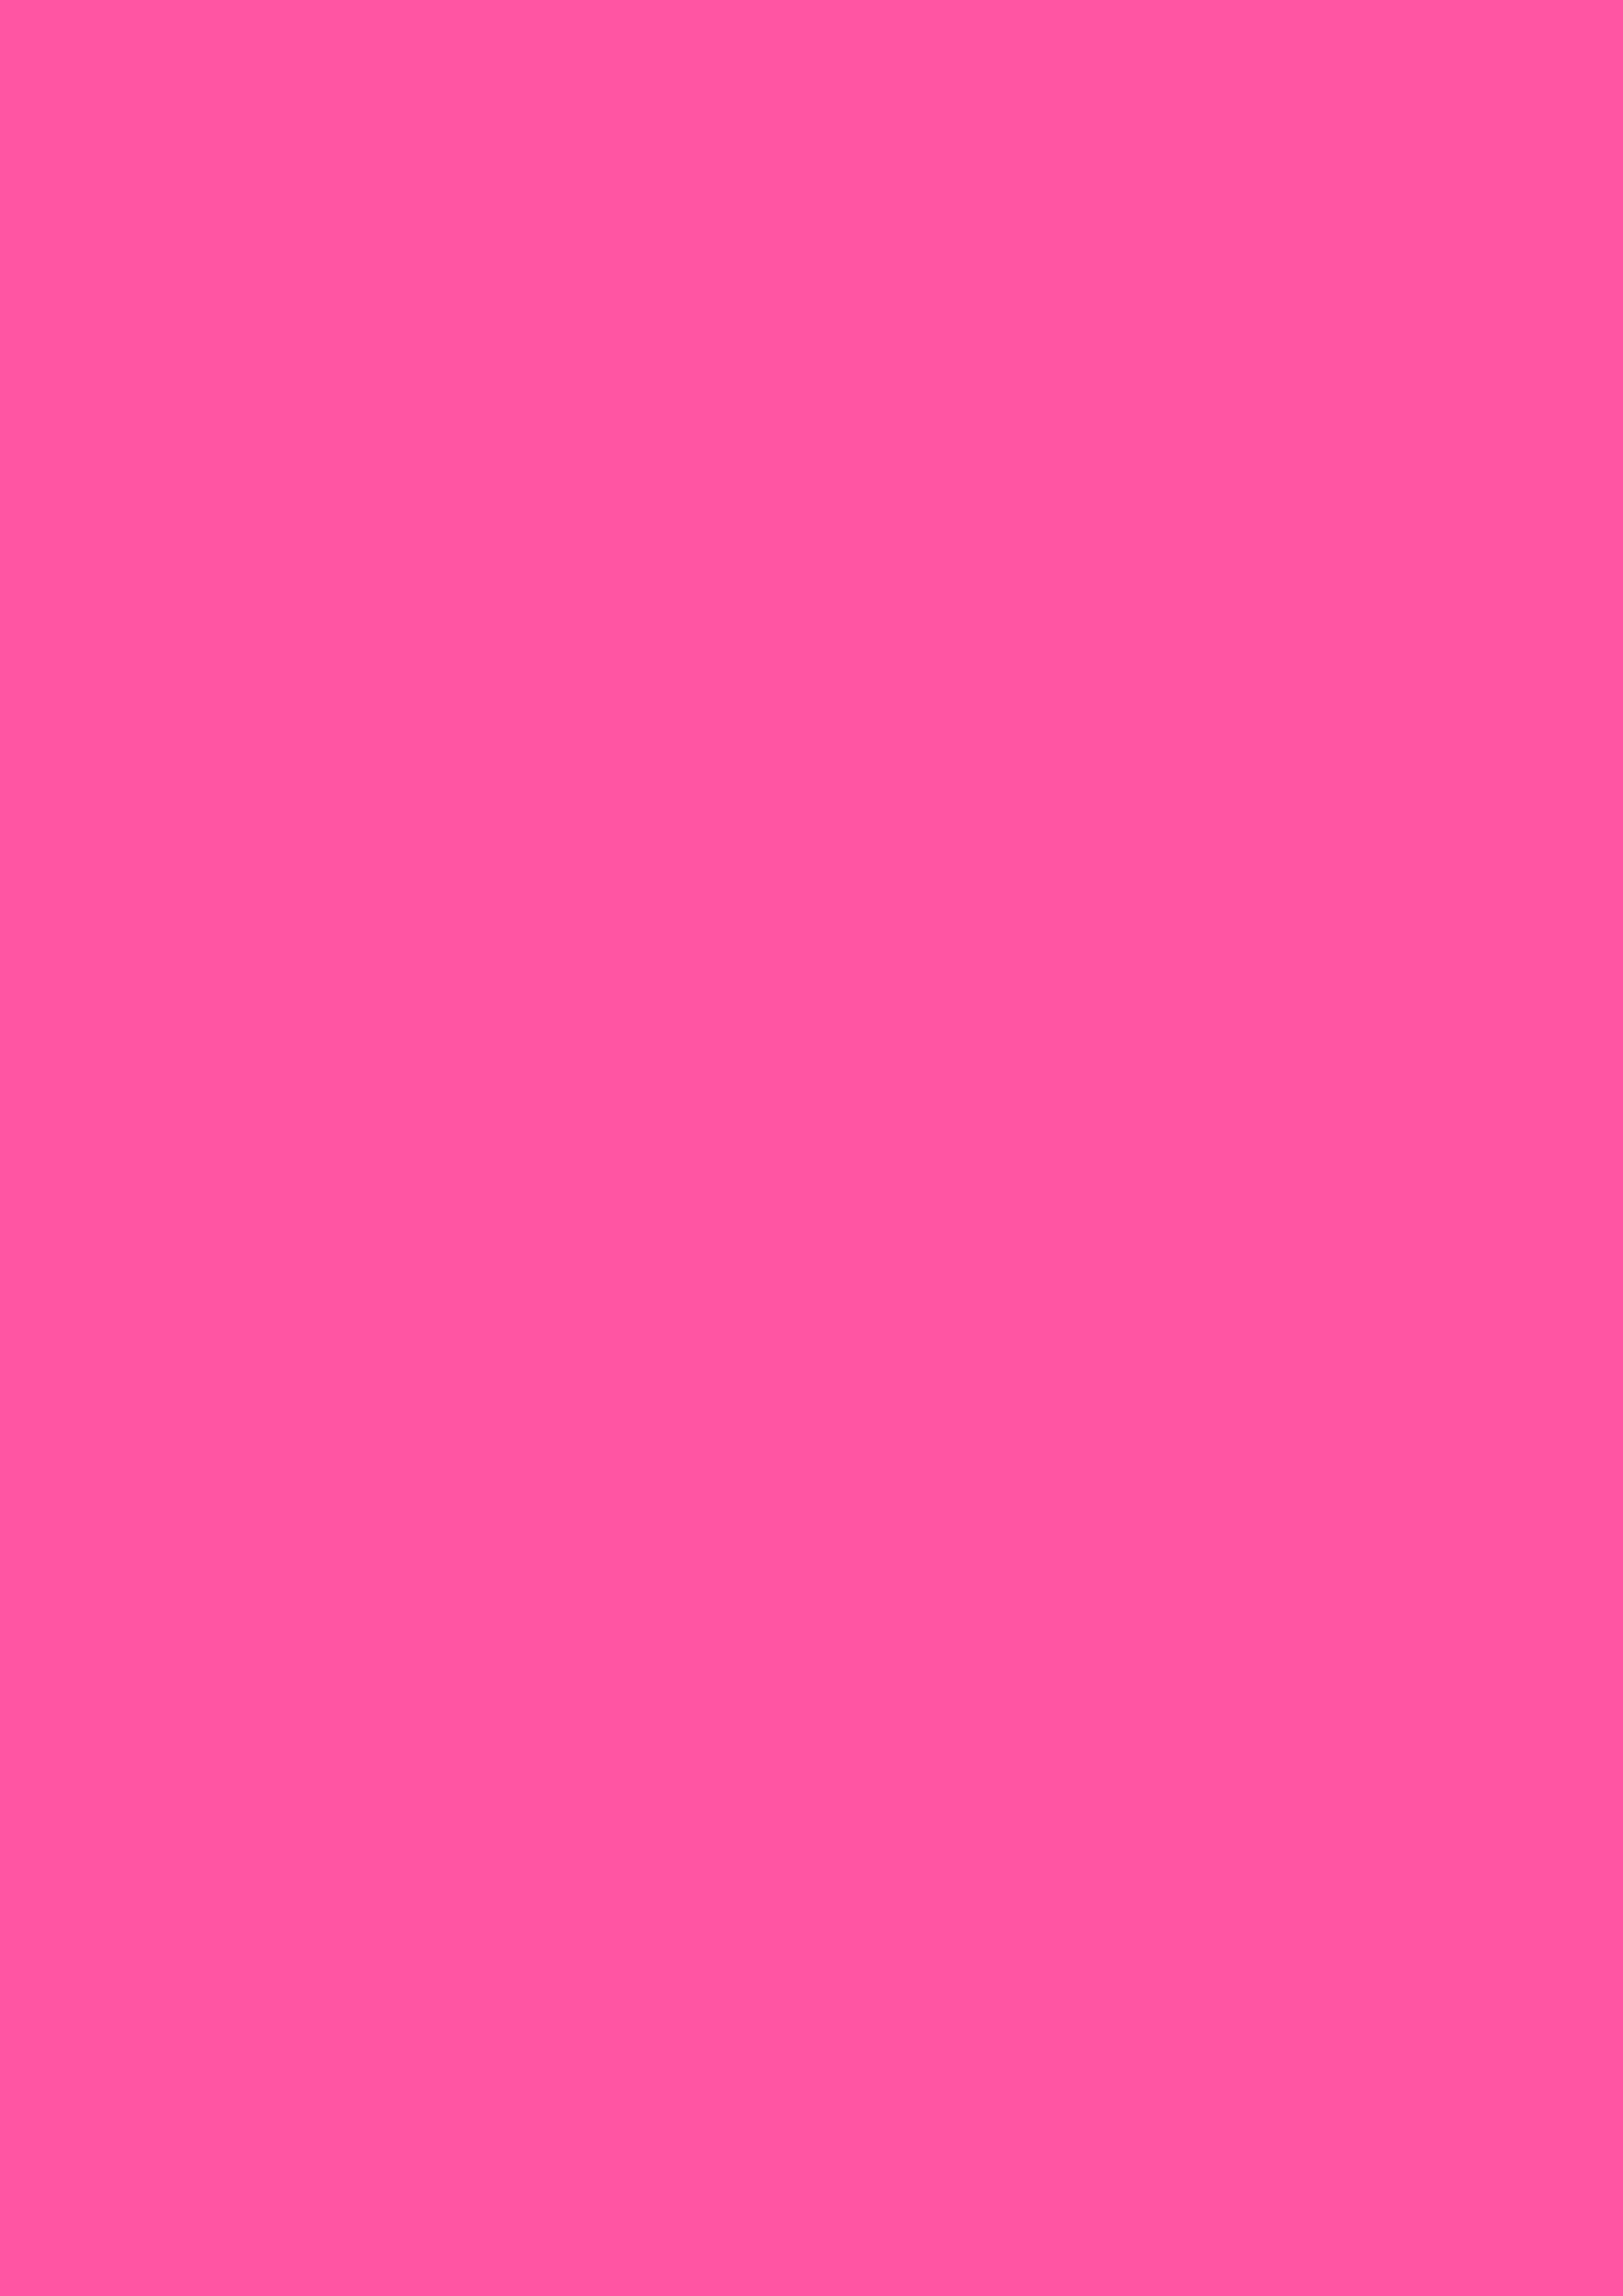 2480x3508 Brilliant Rose Solid Color Background